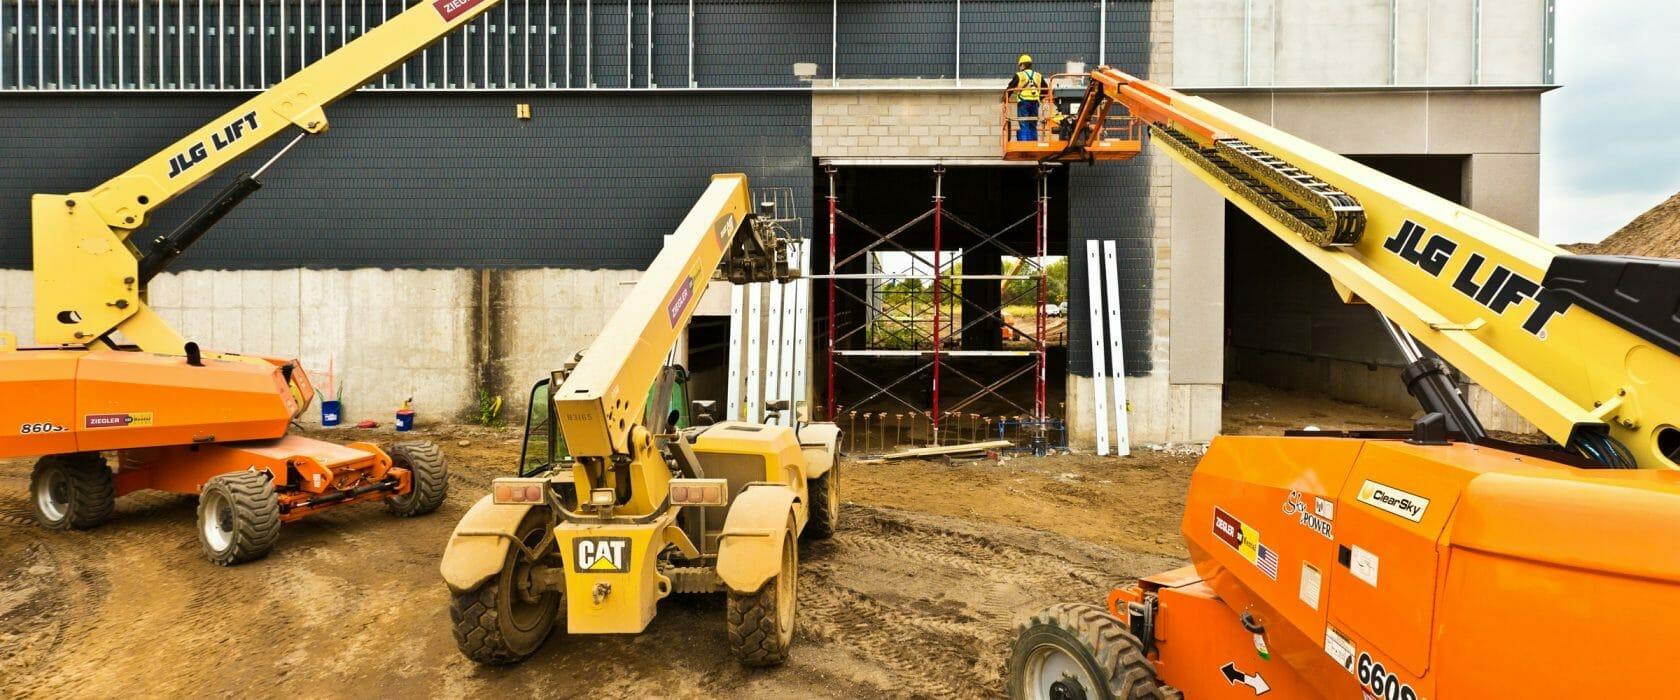 Cat heavy equipment rental machines constructing a building